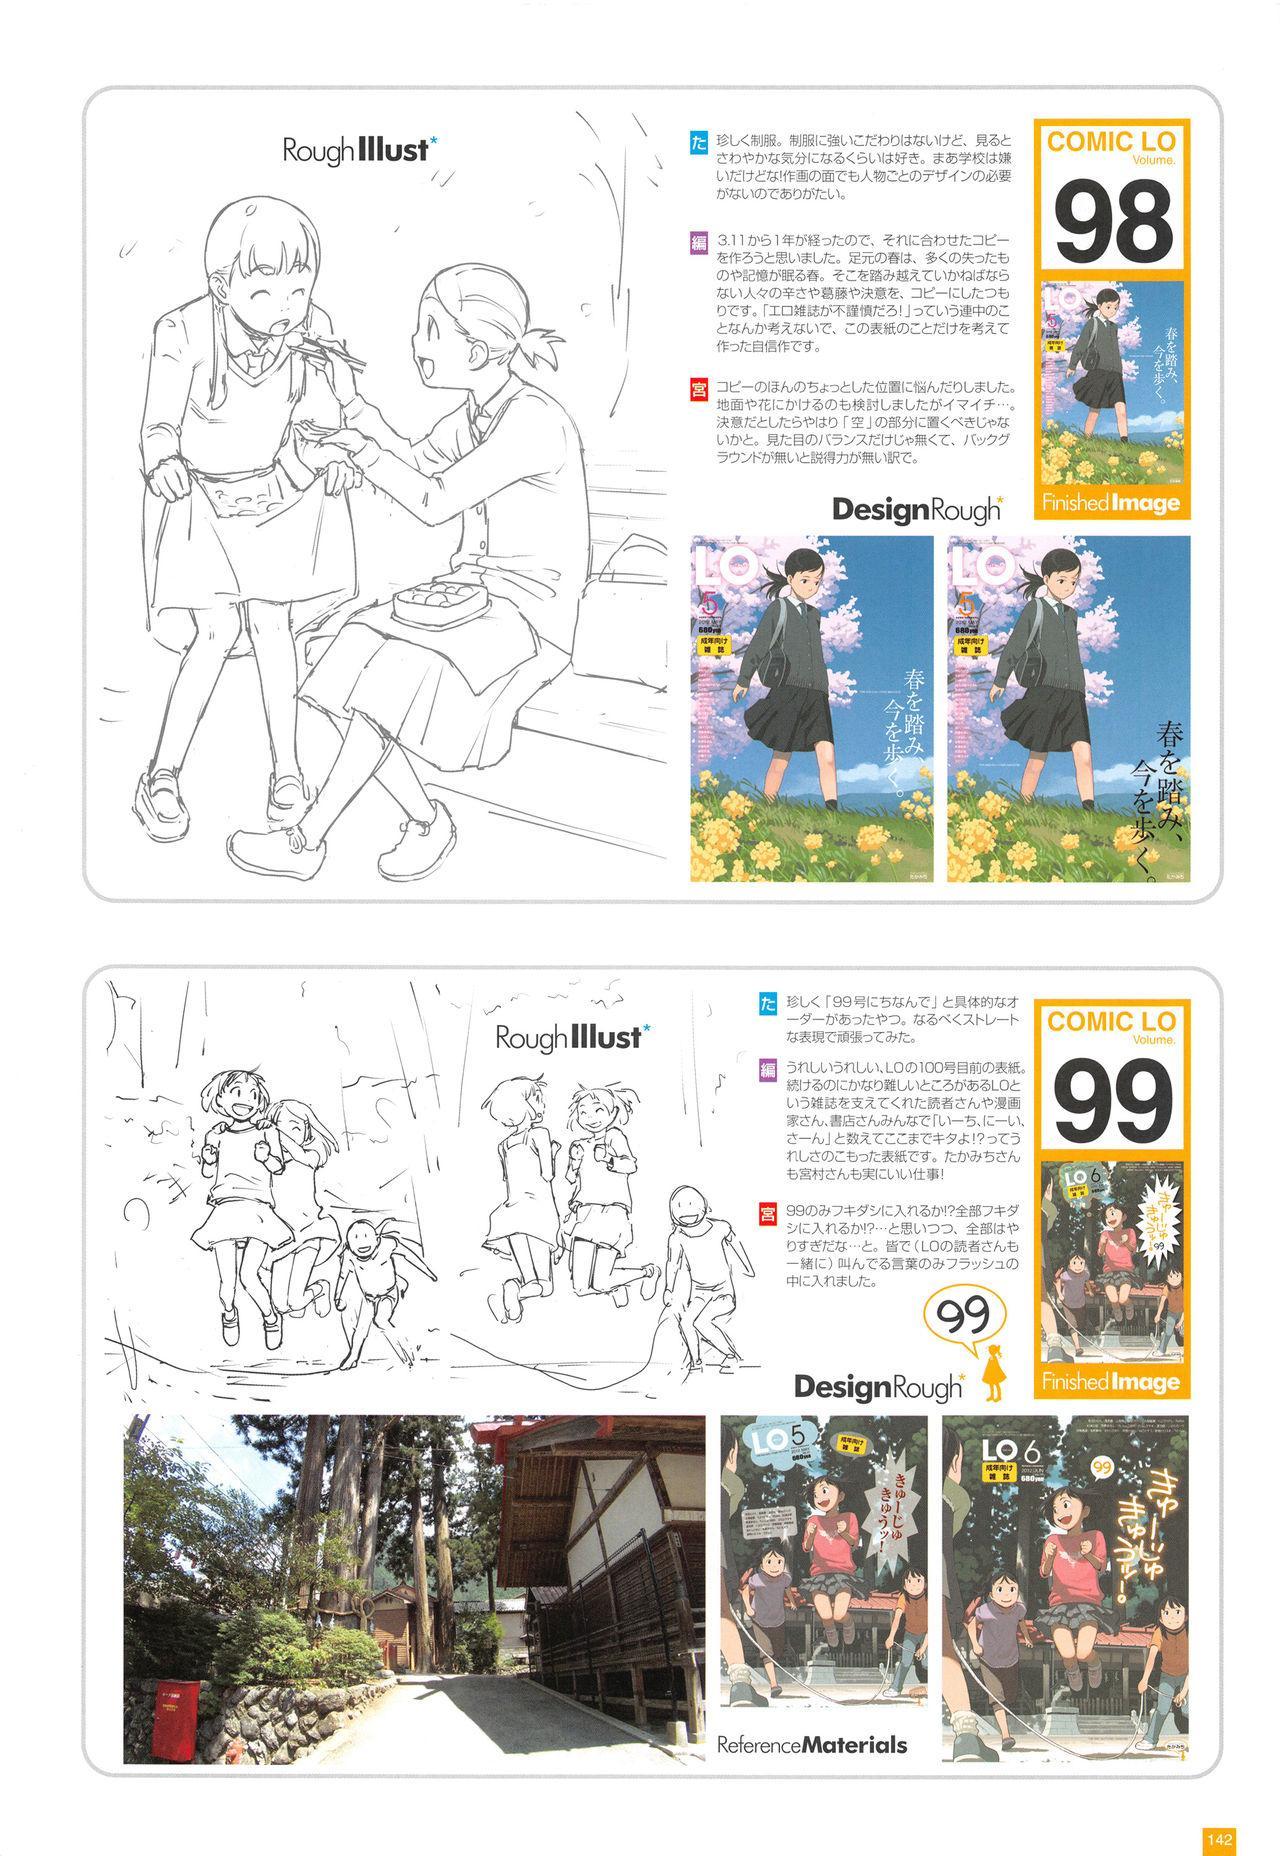 LO Artbook 2-A TAKAMICHI LOOP WORKS 144